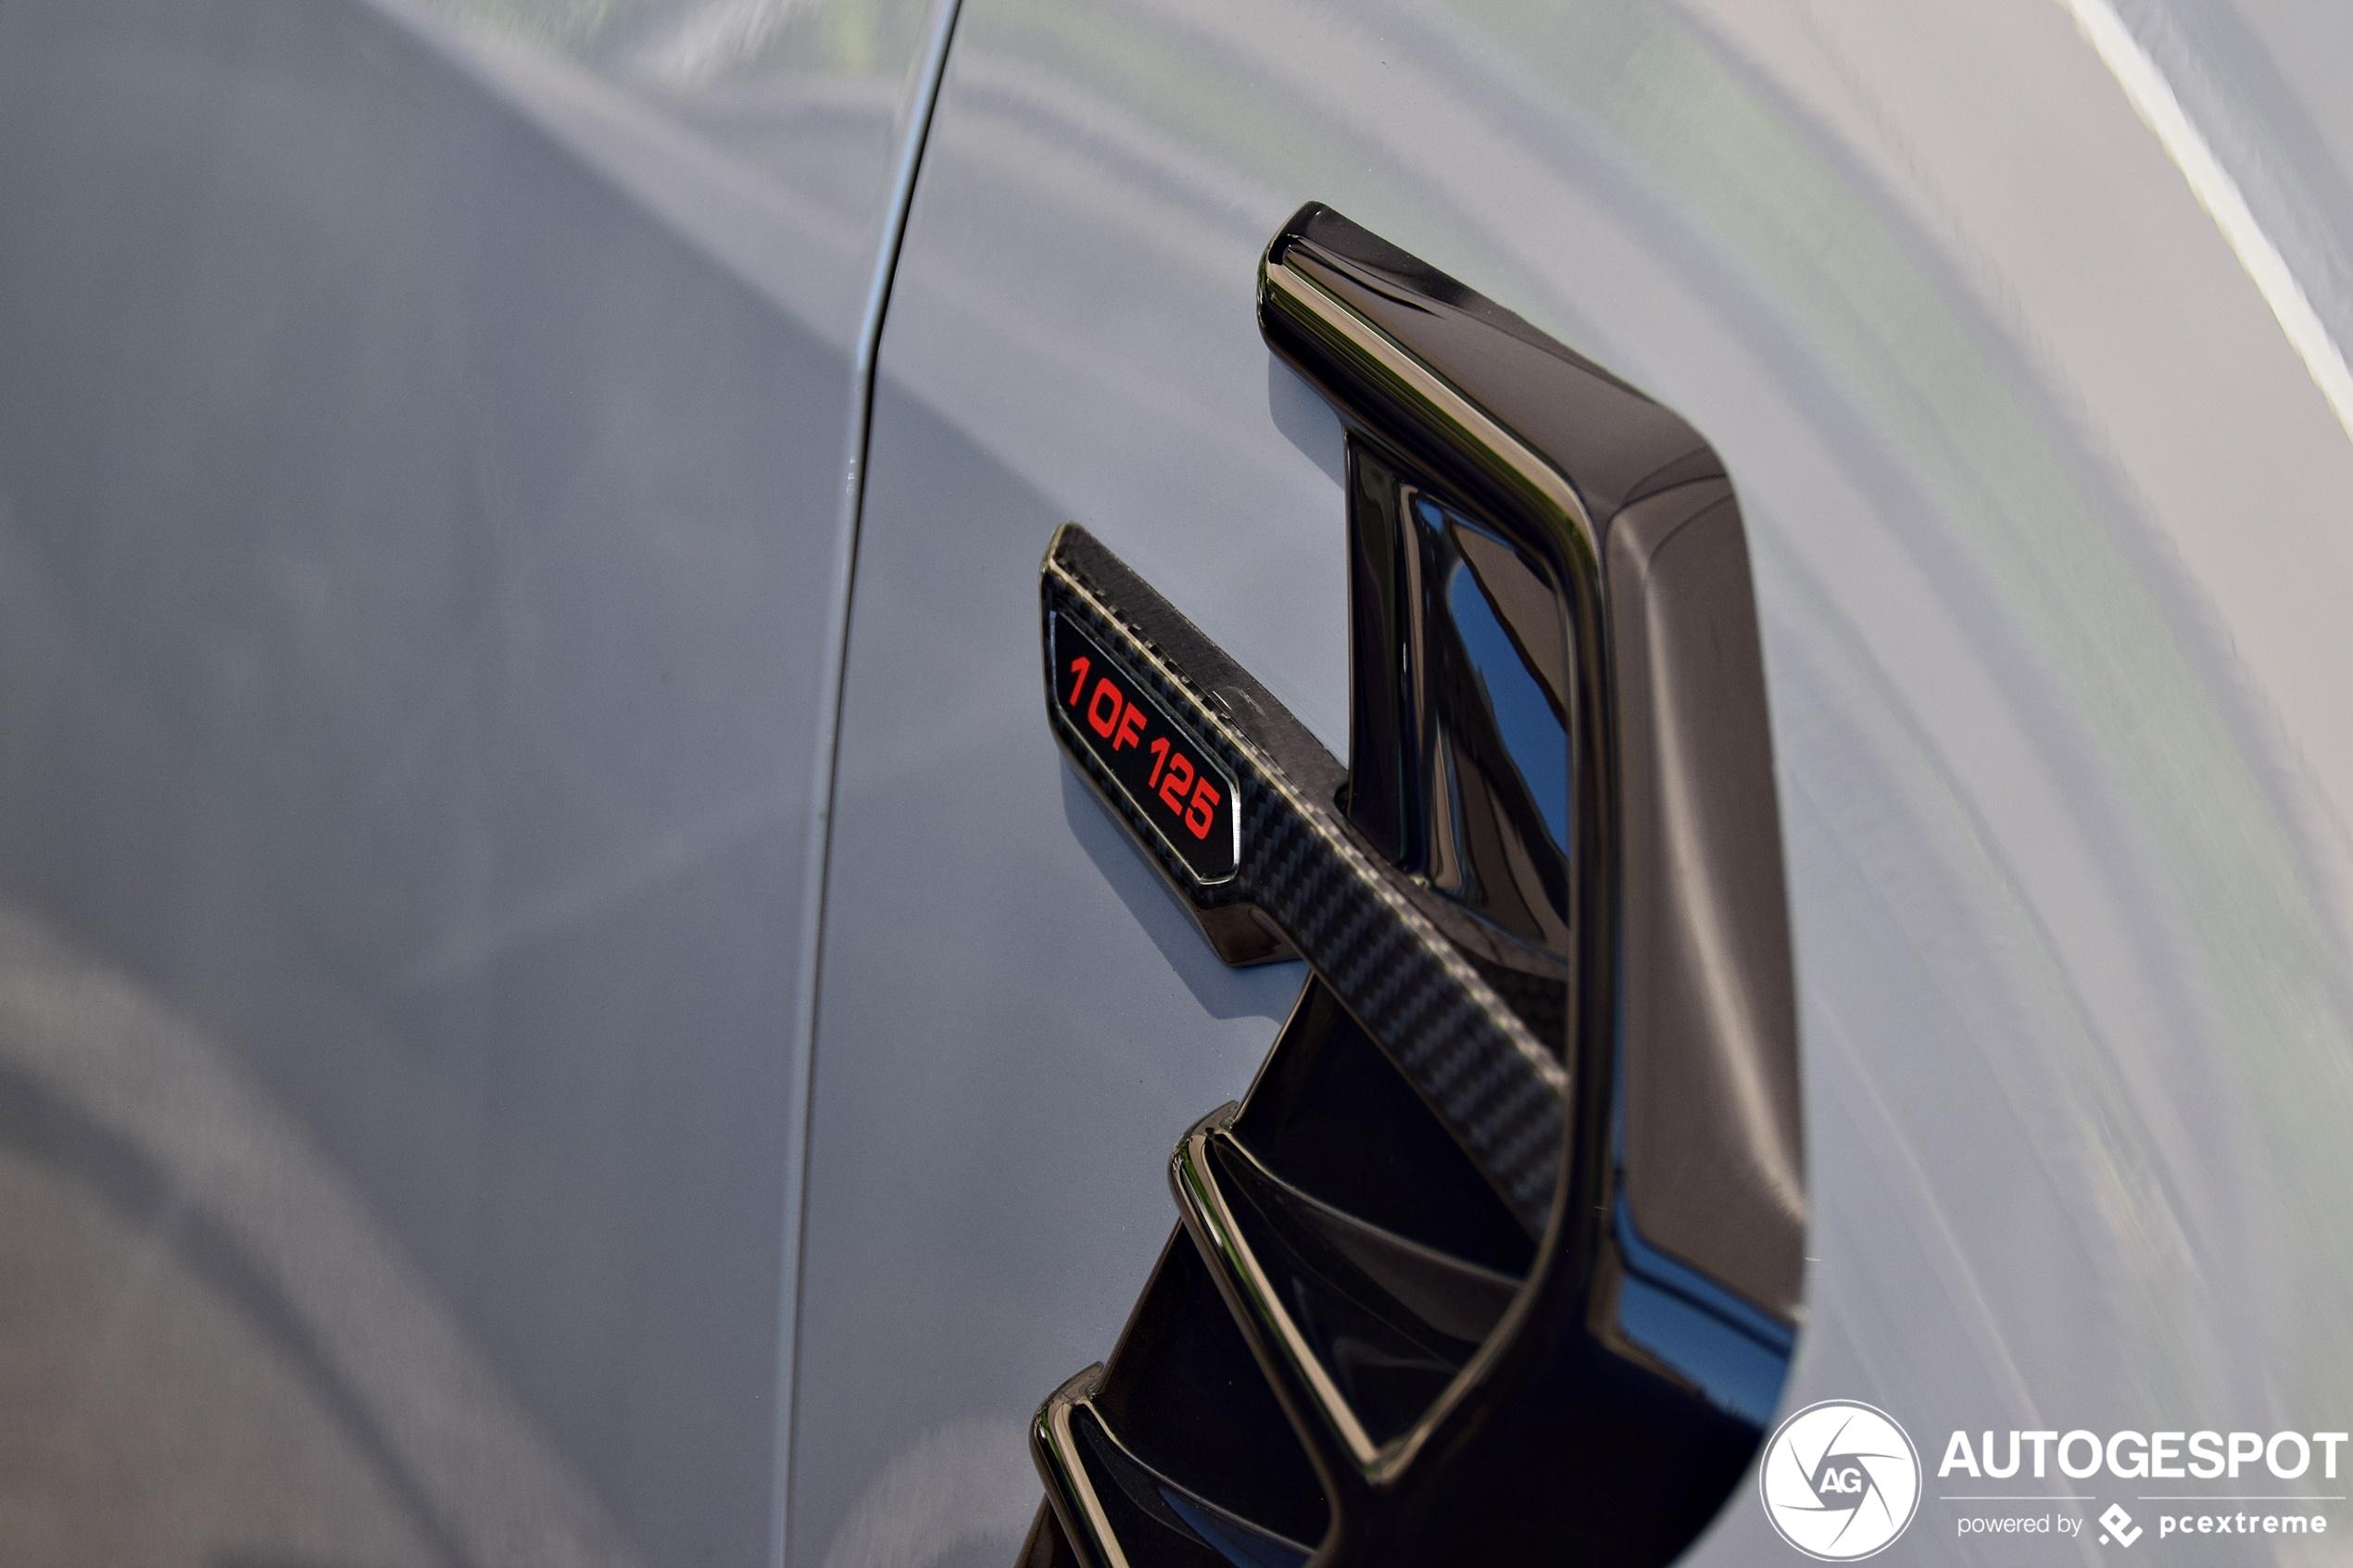 Audi ABT RS6-R Avant C8 - 30 januari 2021 - Autogespot